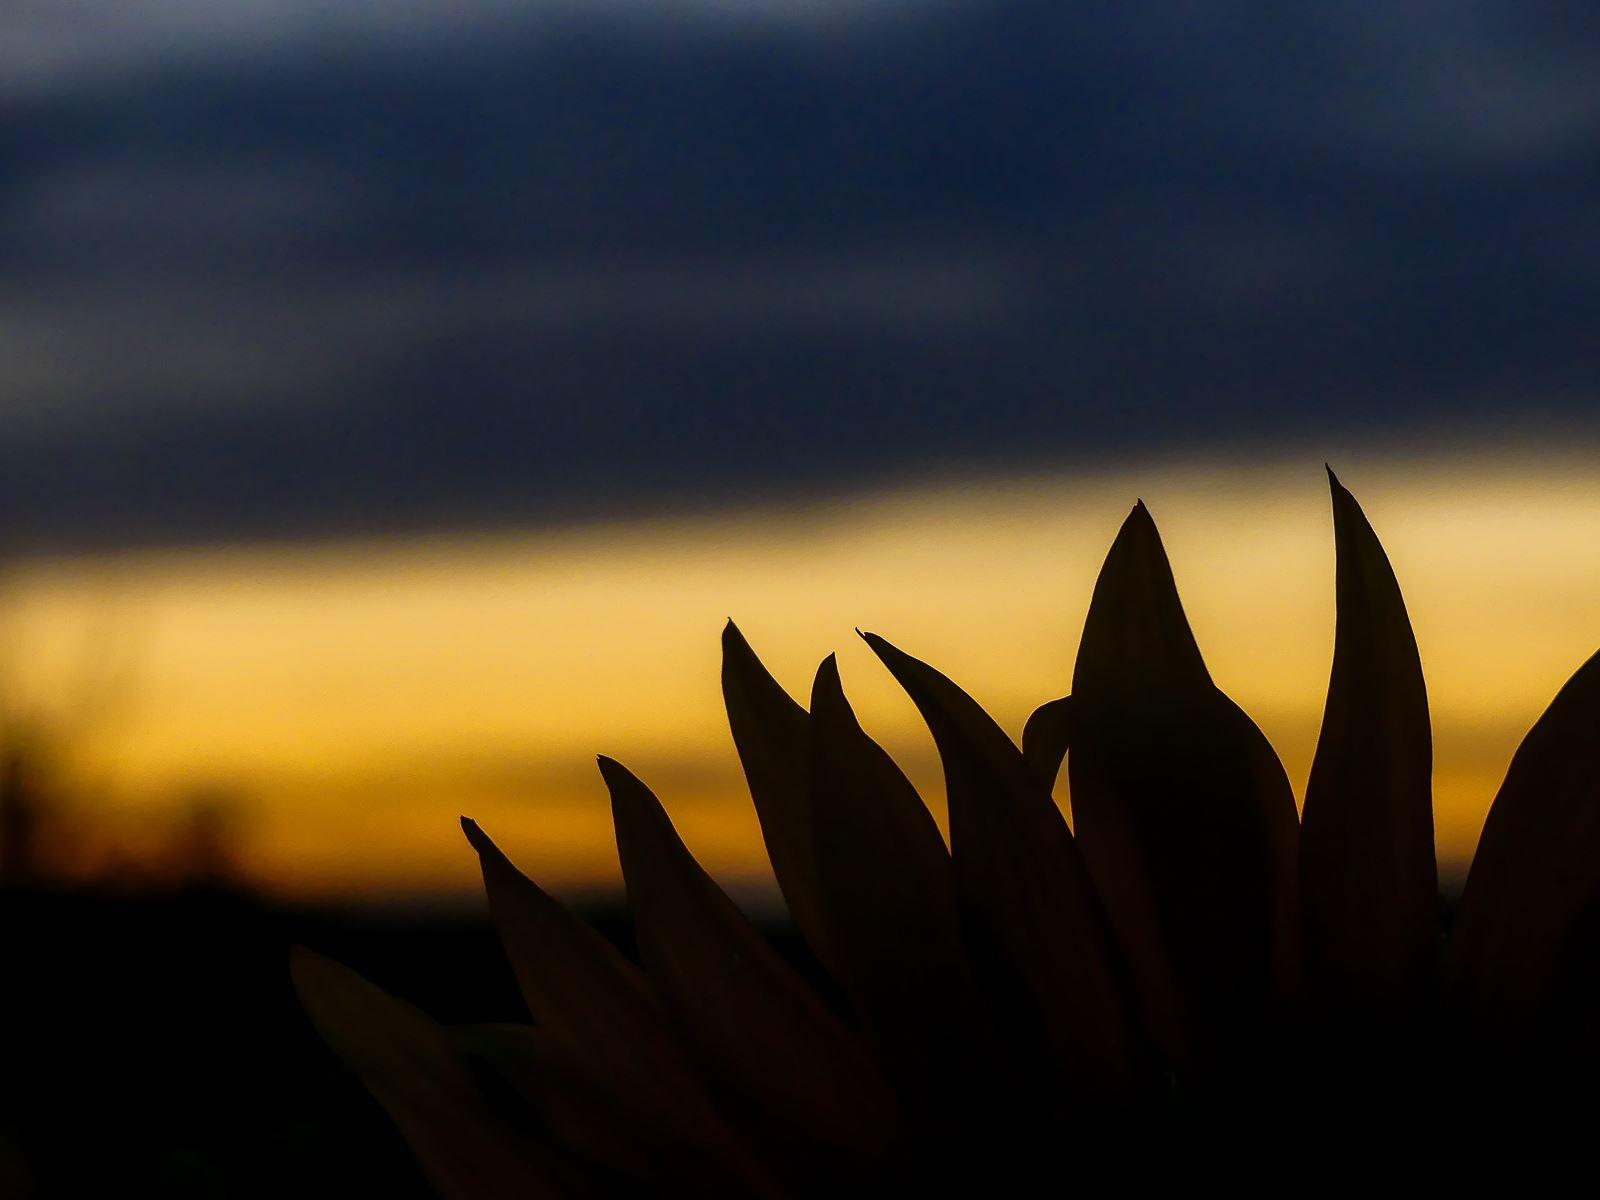 Sunset tournesols- Gardouch